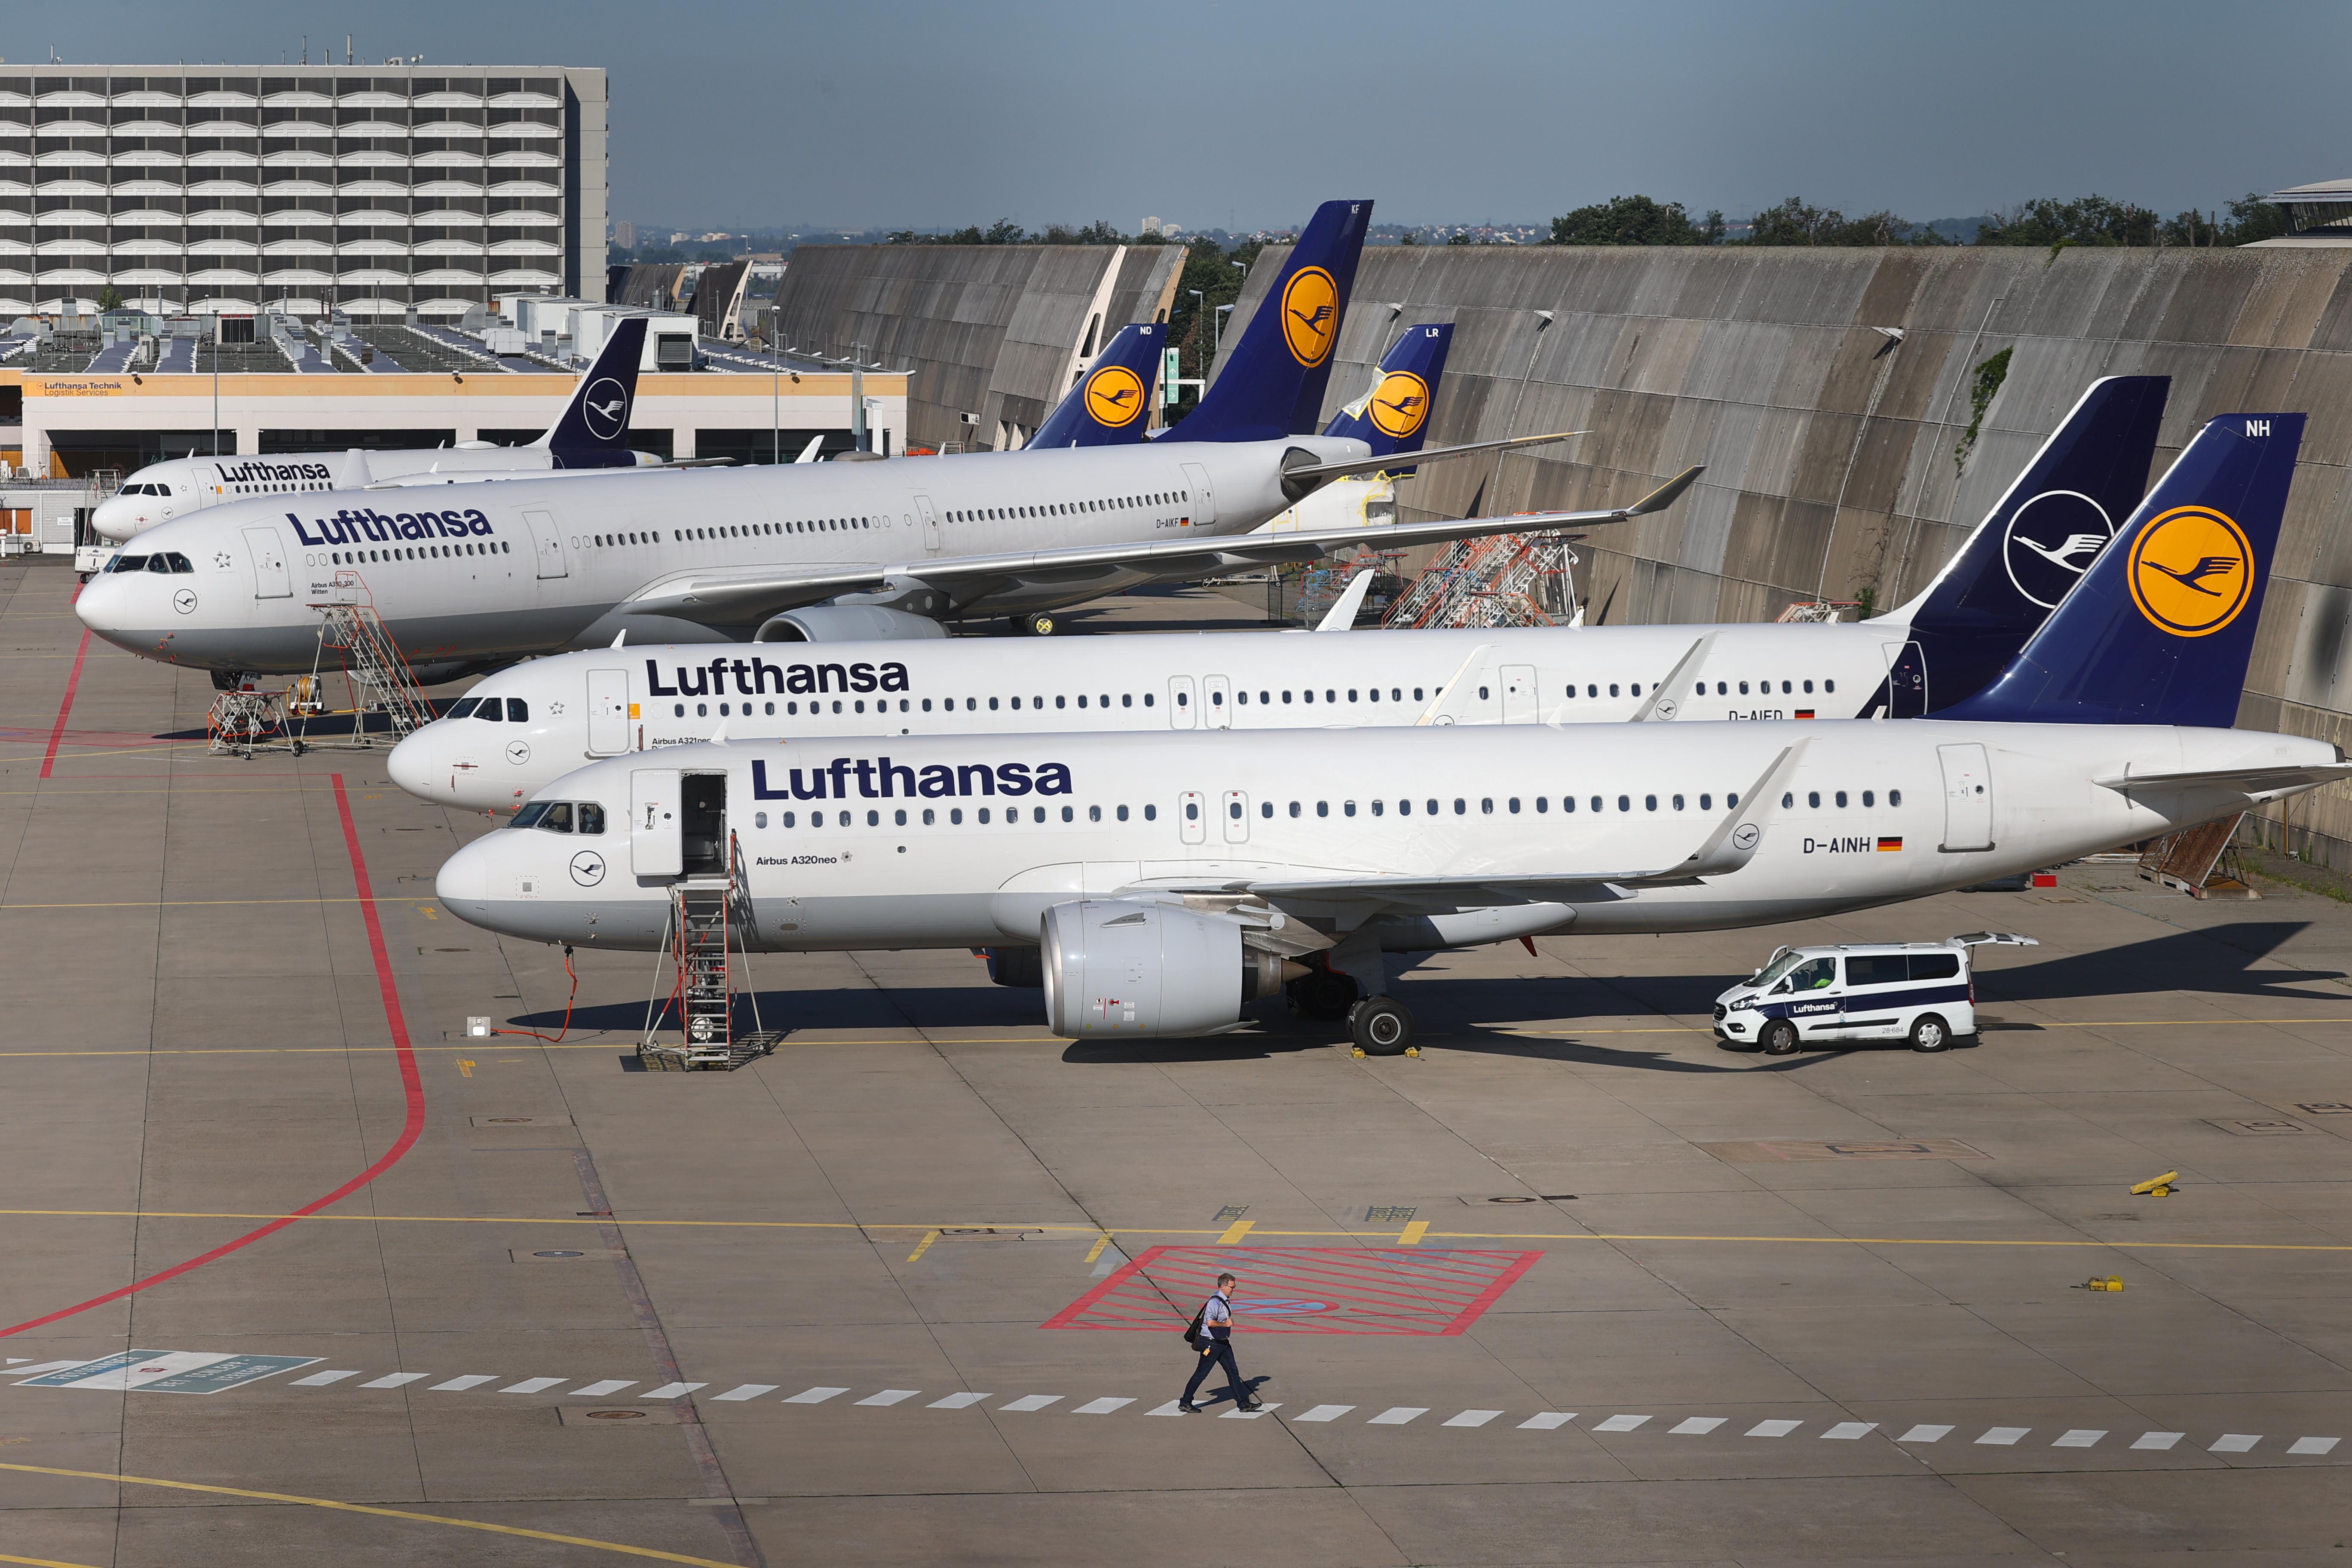 Lufthansa planes are seen at Frankfurt Airport, Germany, June 25, 2020.